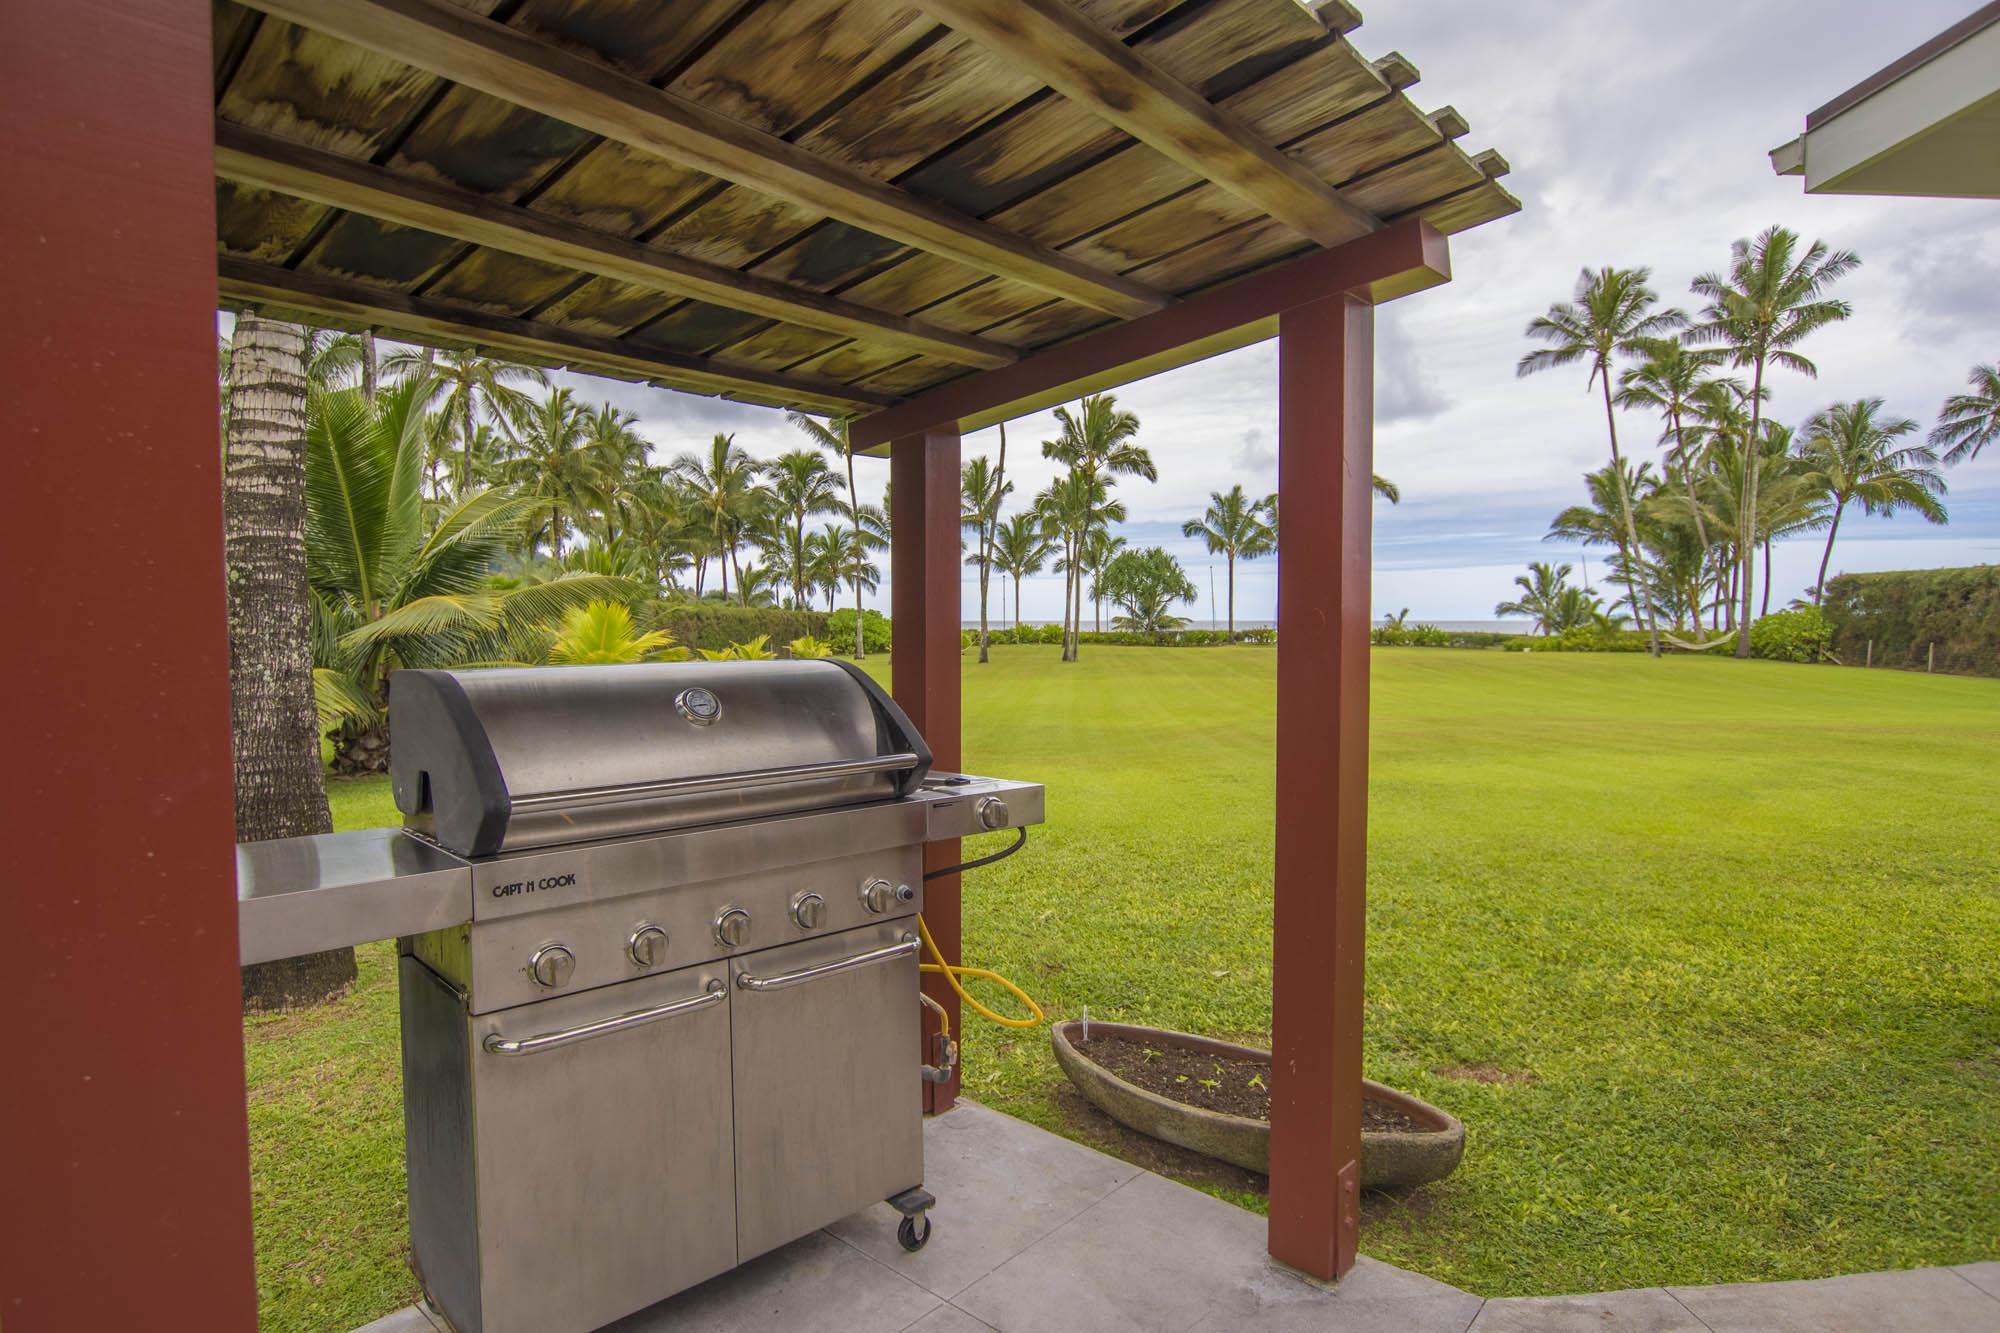 Kauai-217-Hanalei Bay47